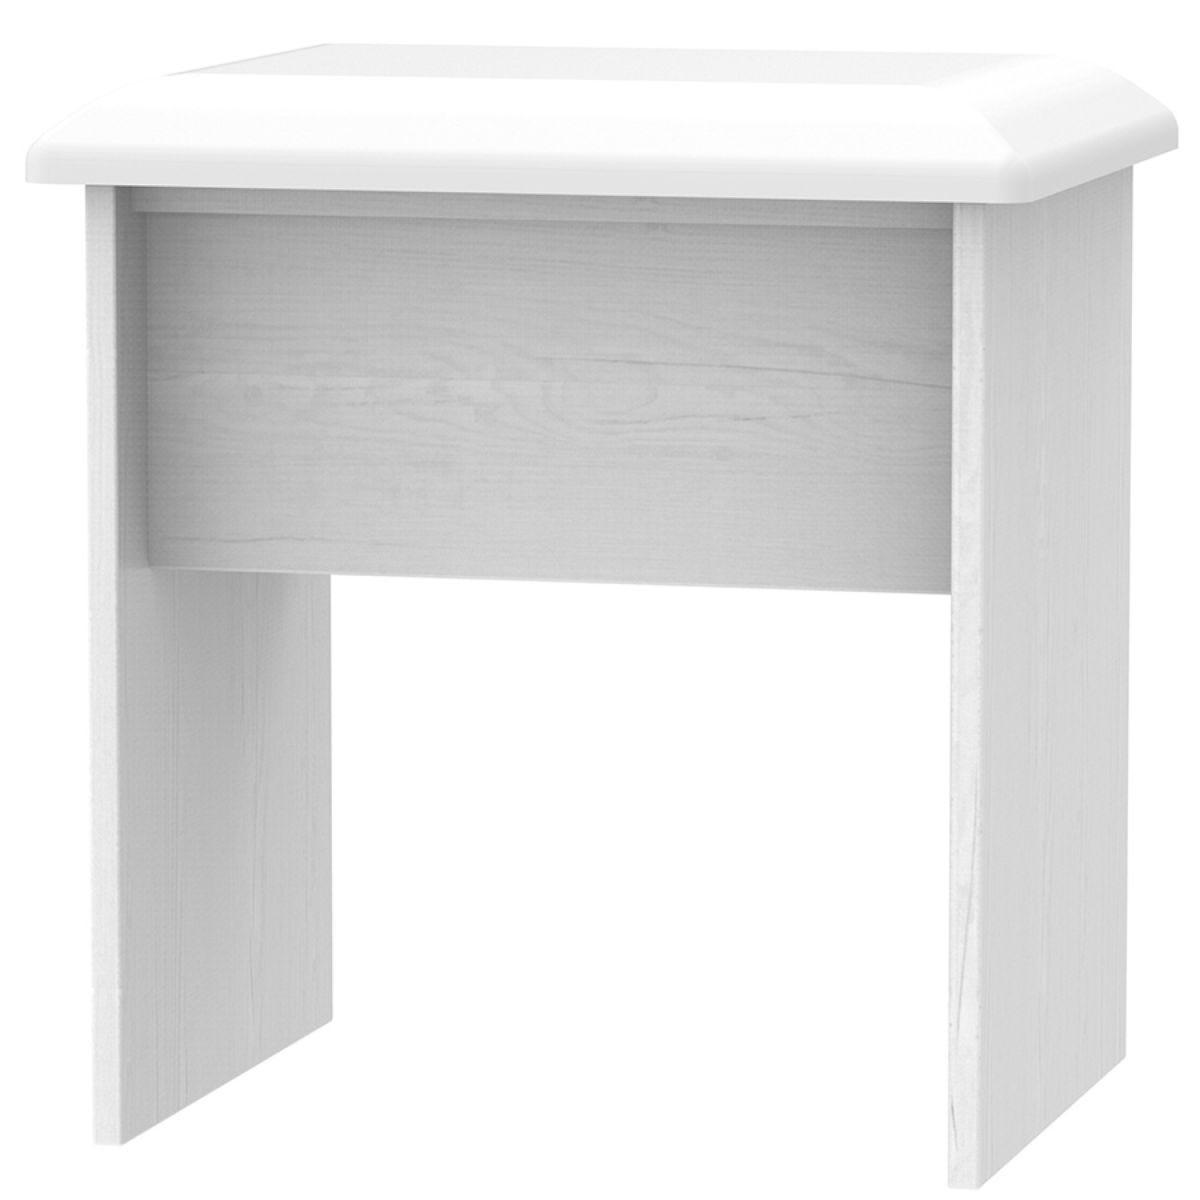 Otega Dressing Table Stool - White